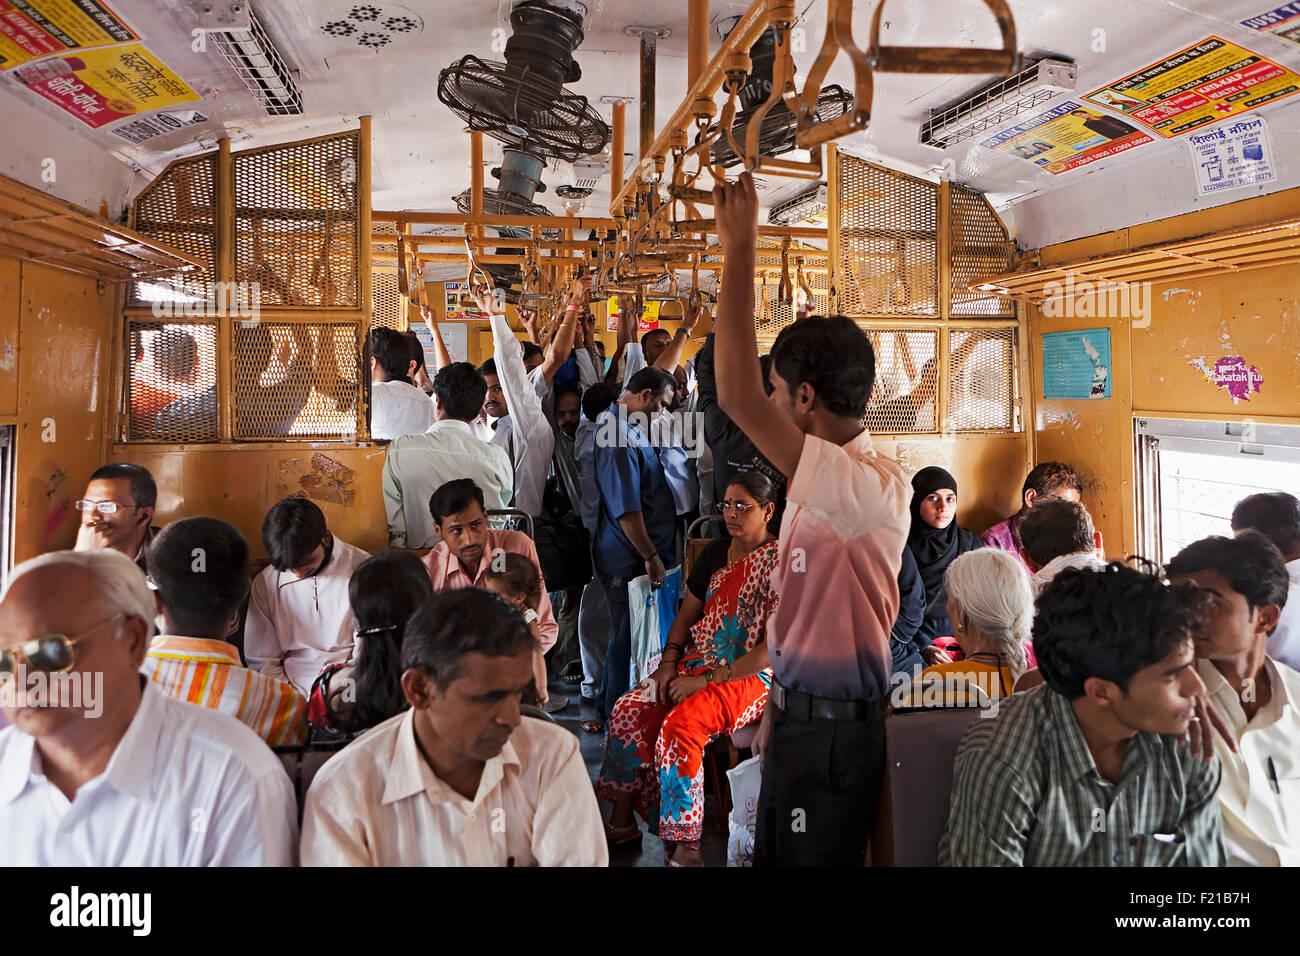 India, Maharashtra, Mumbai, Interior of second class carriage of a surburban train. - Stock Image